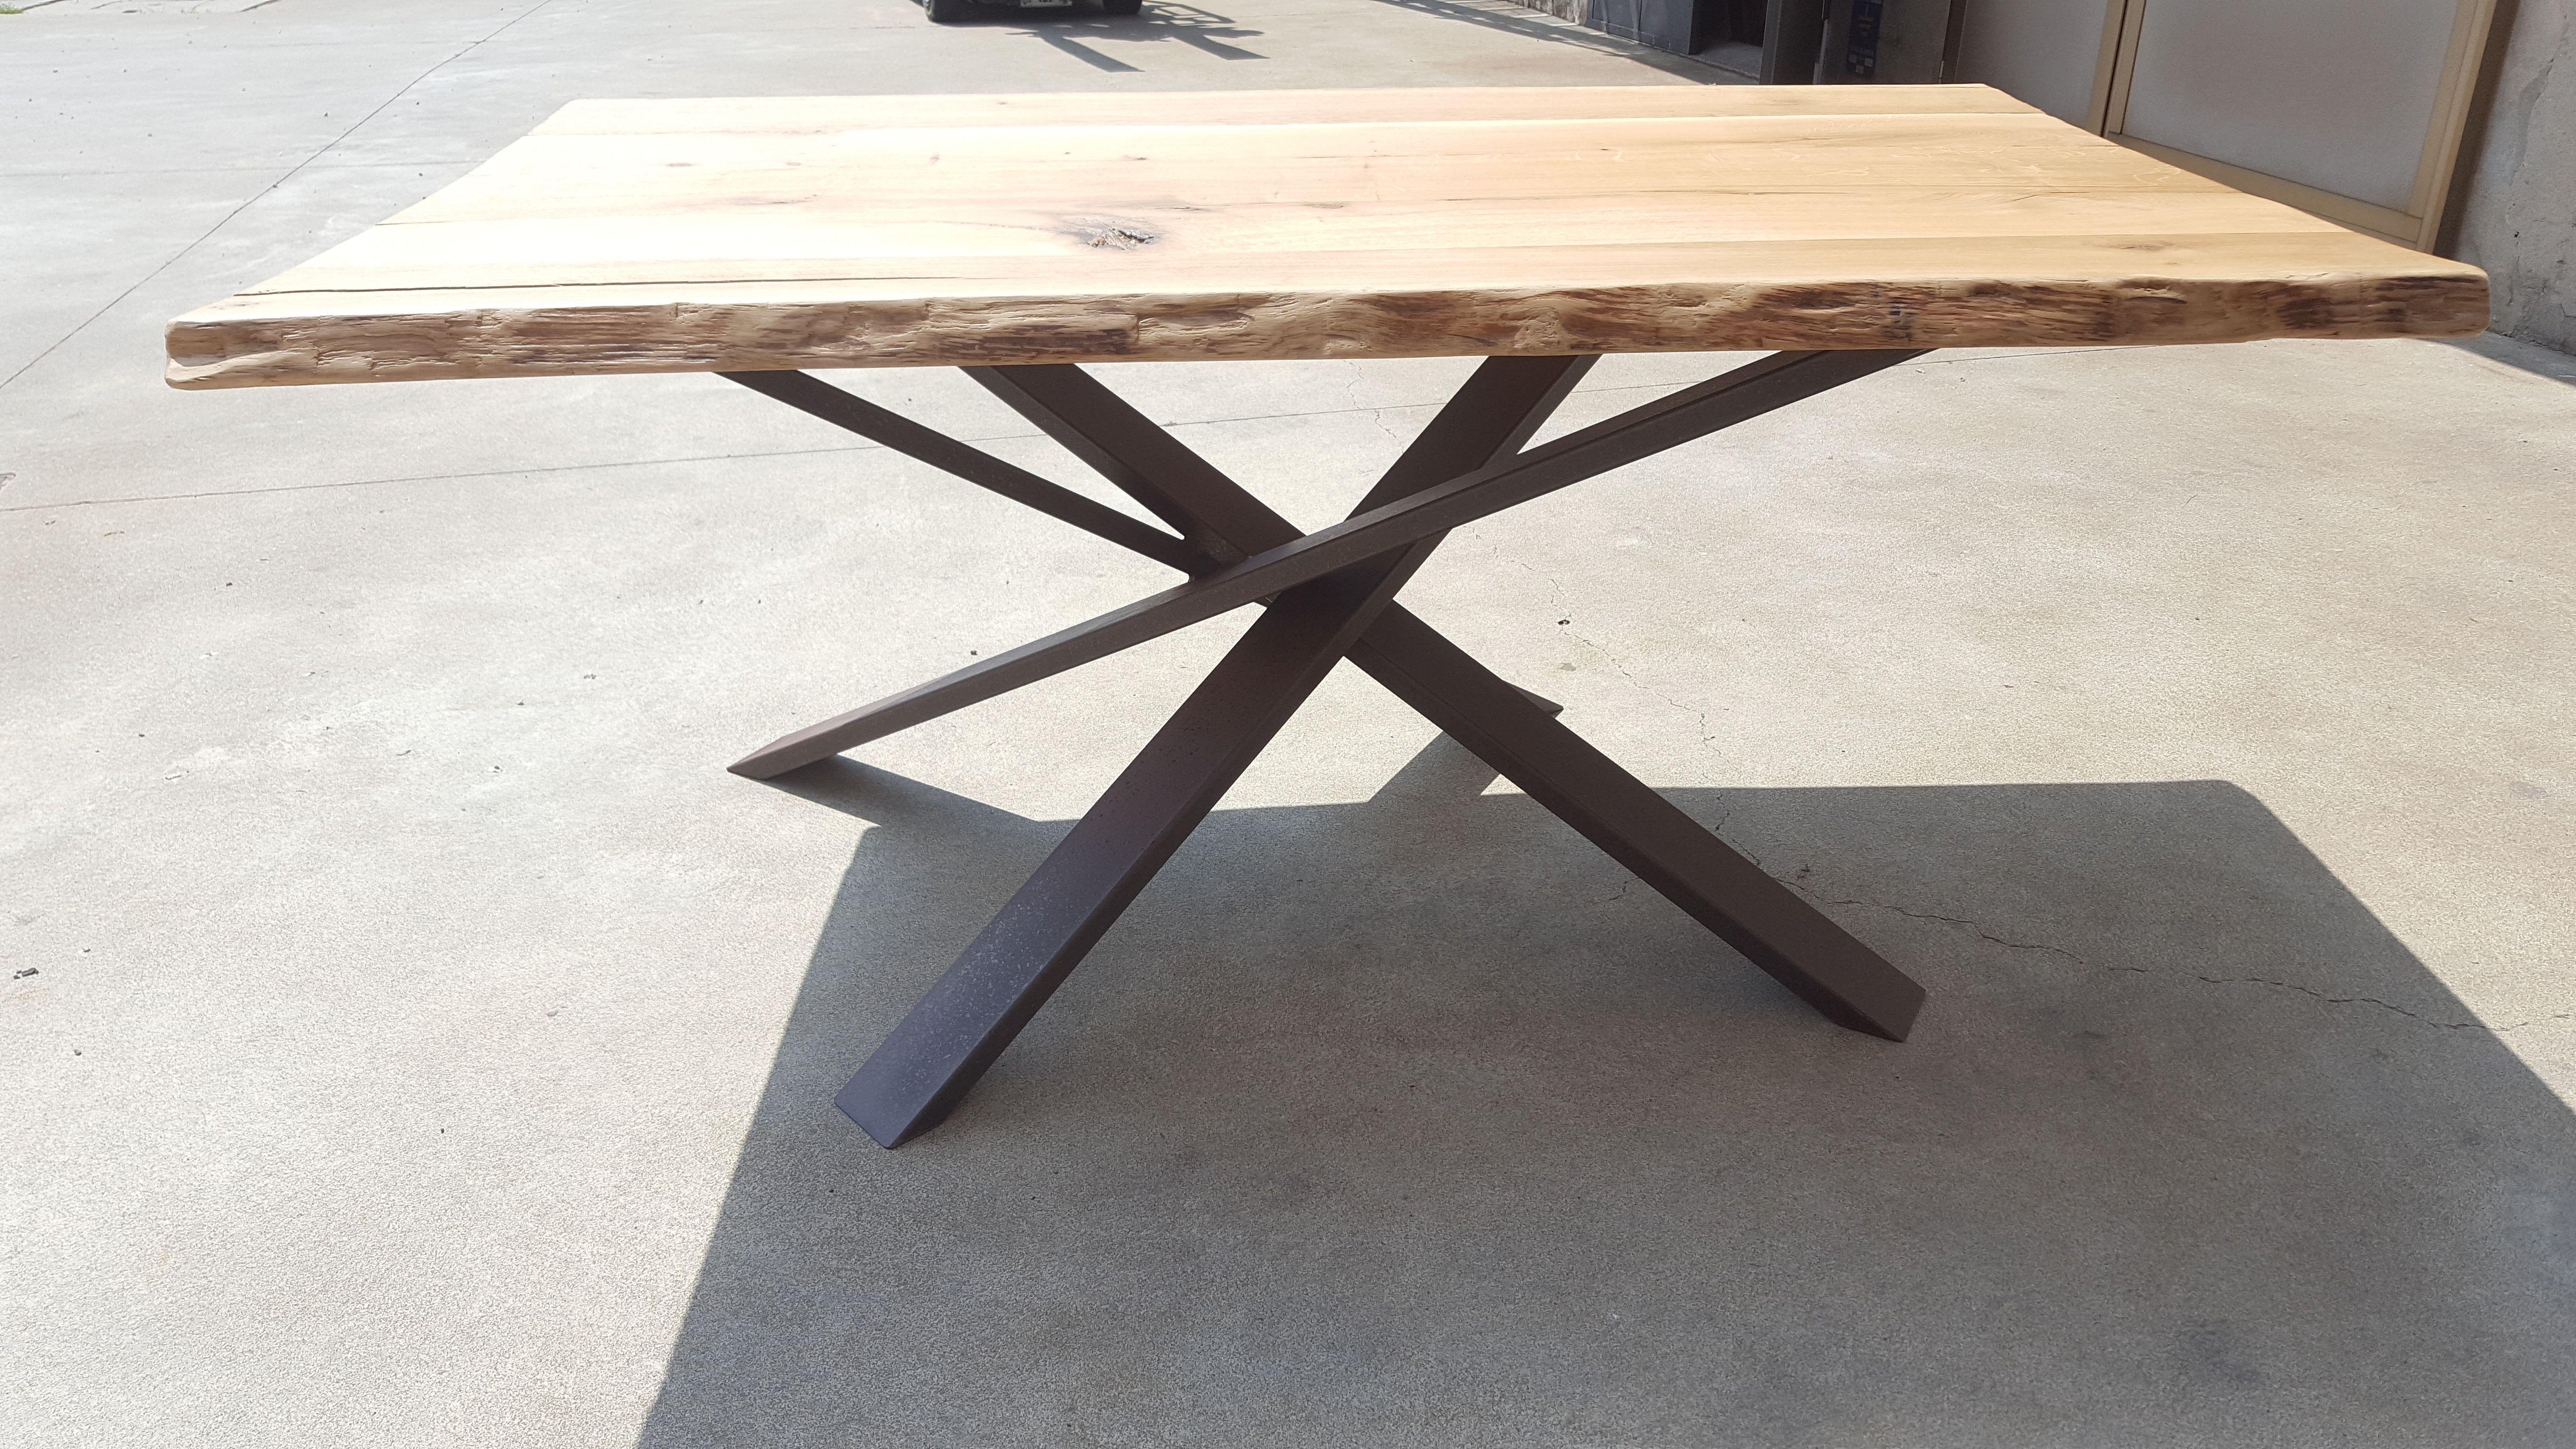 Tavolo Con Piede Centrale tavolo con piede centrale